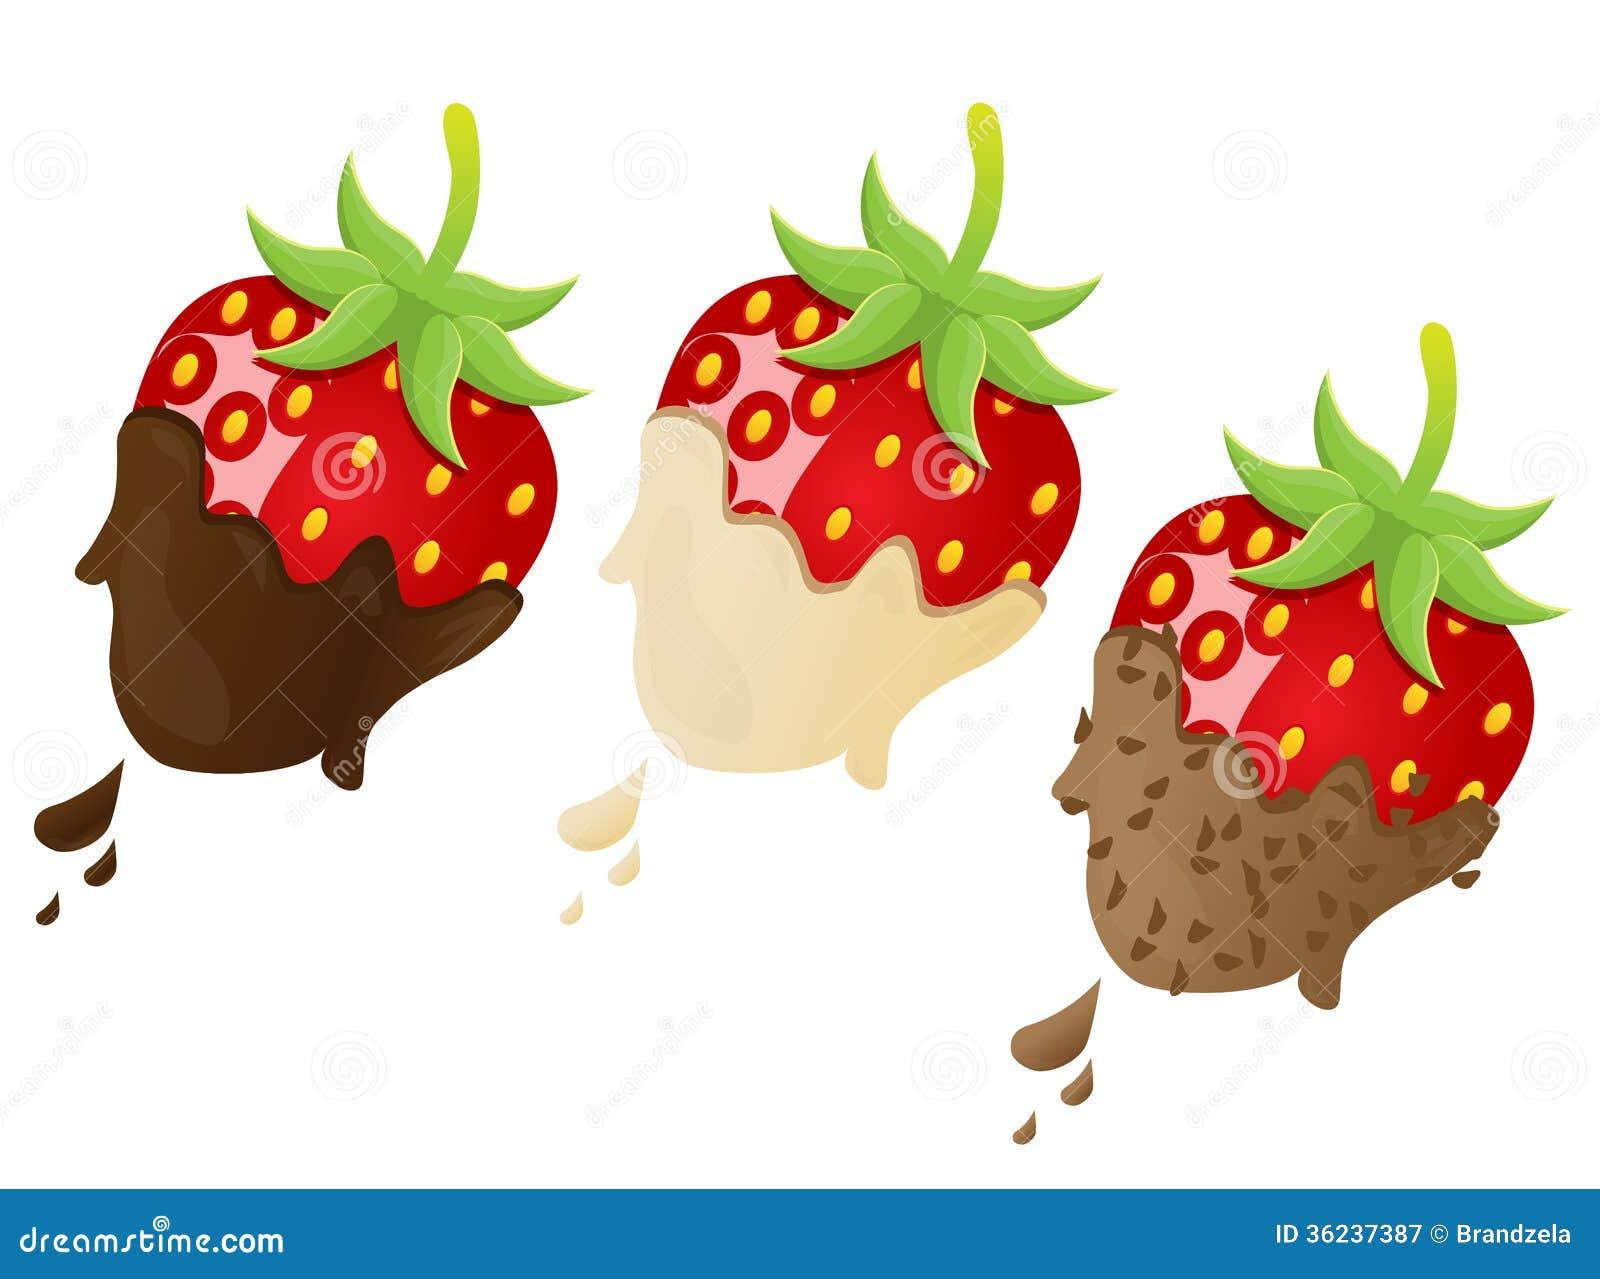 Strawberry Vector Illustration Royalty Free Stock ...